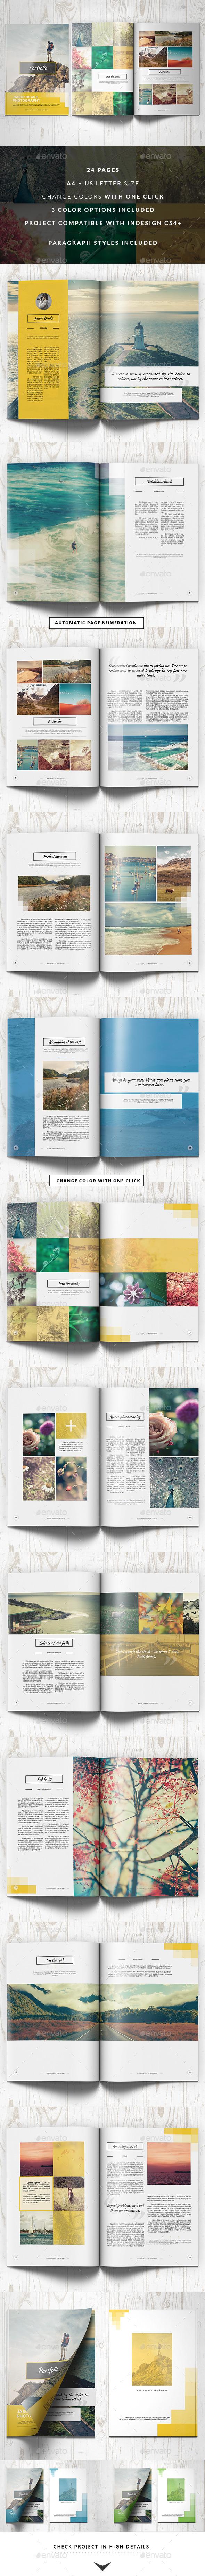 GraphicRiver Portfolio Modern Catalog Brochure 10543612